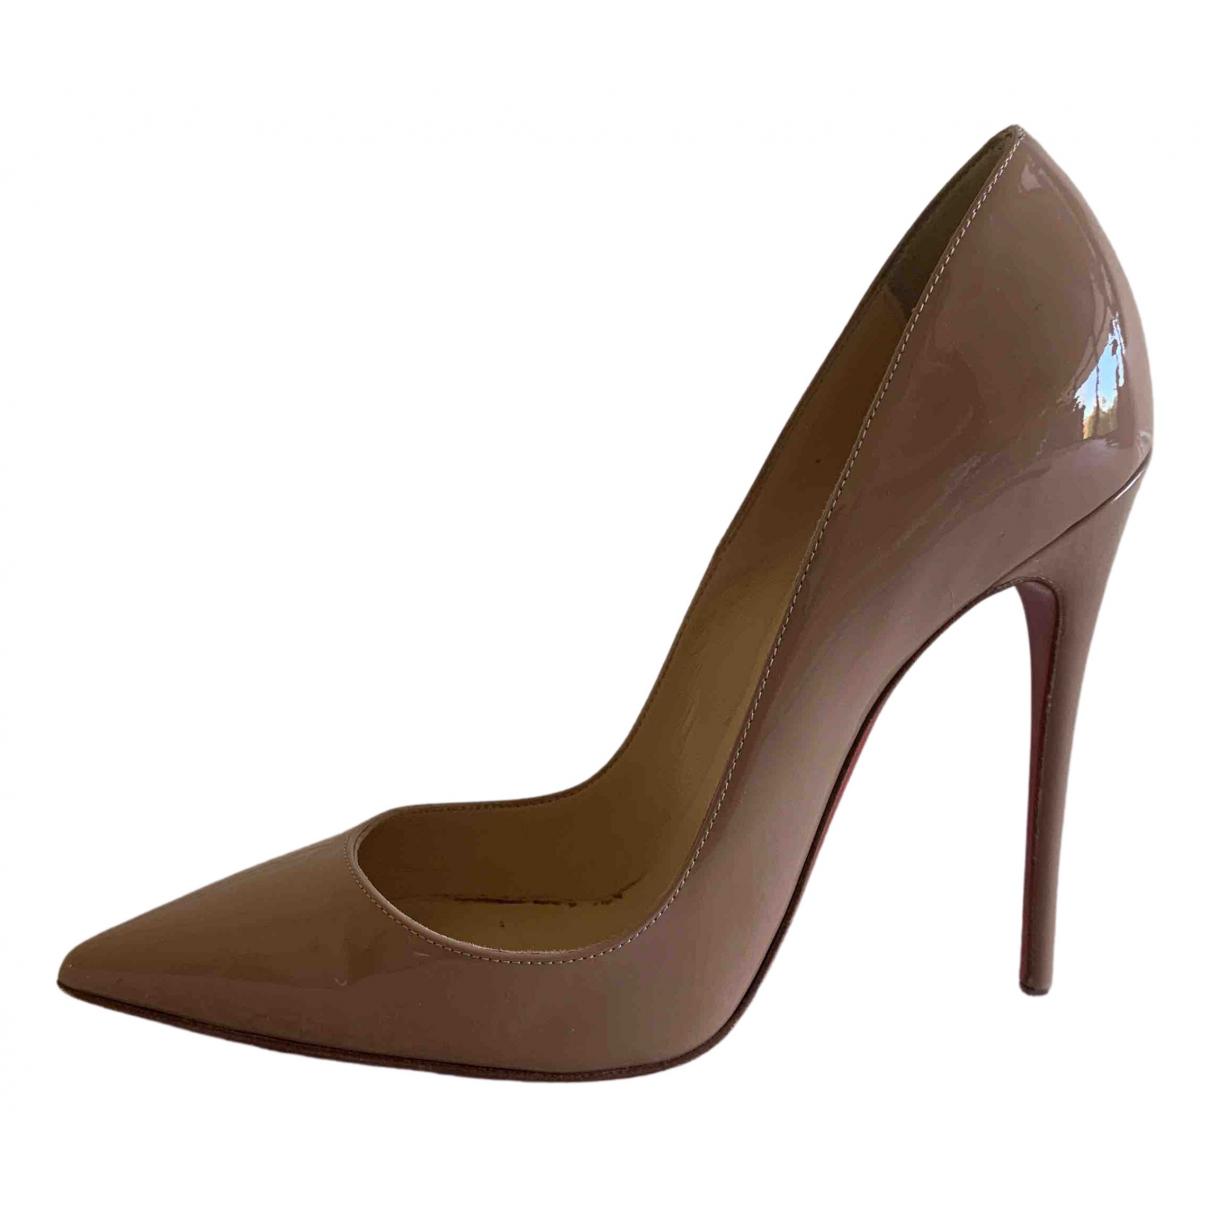 Christian Louboutin So Kate  Beige Patent leather Heels for Women 36 EU